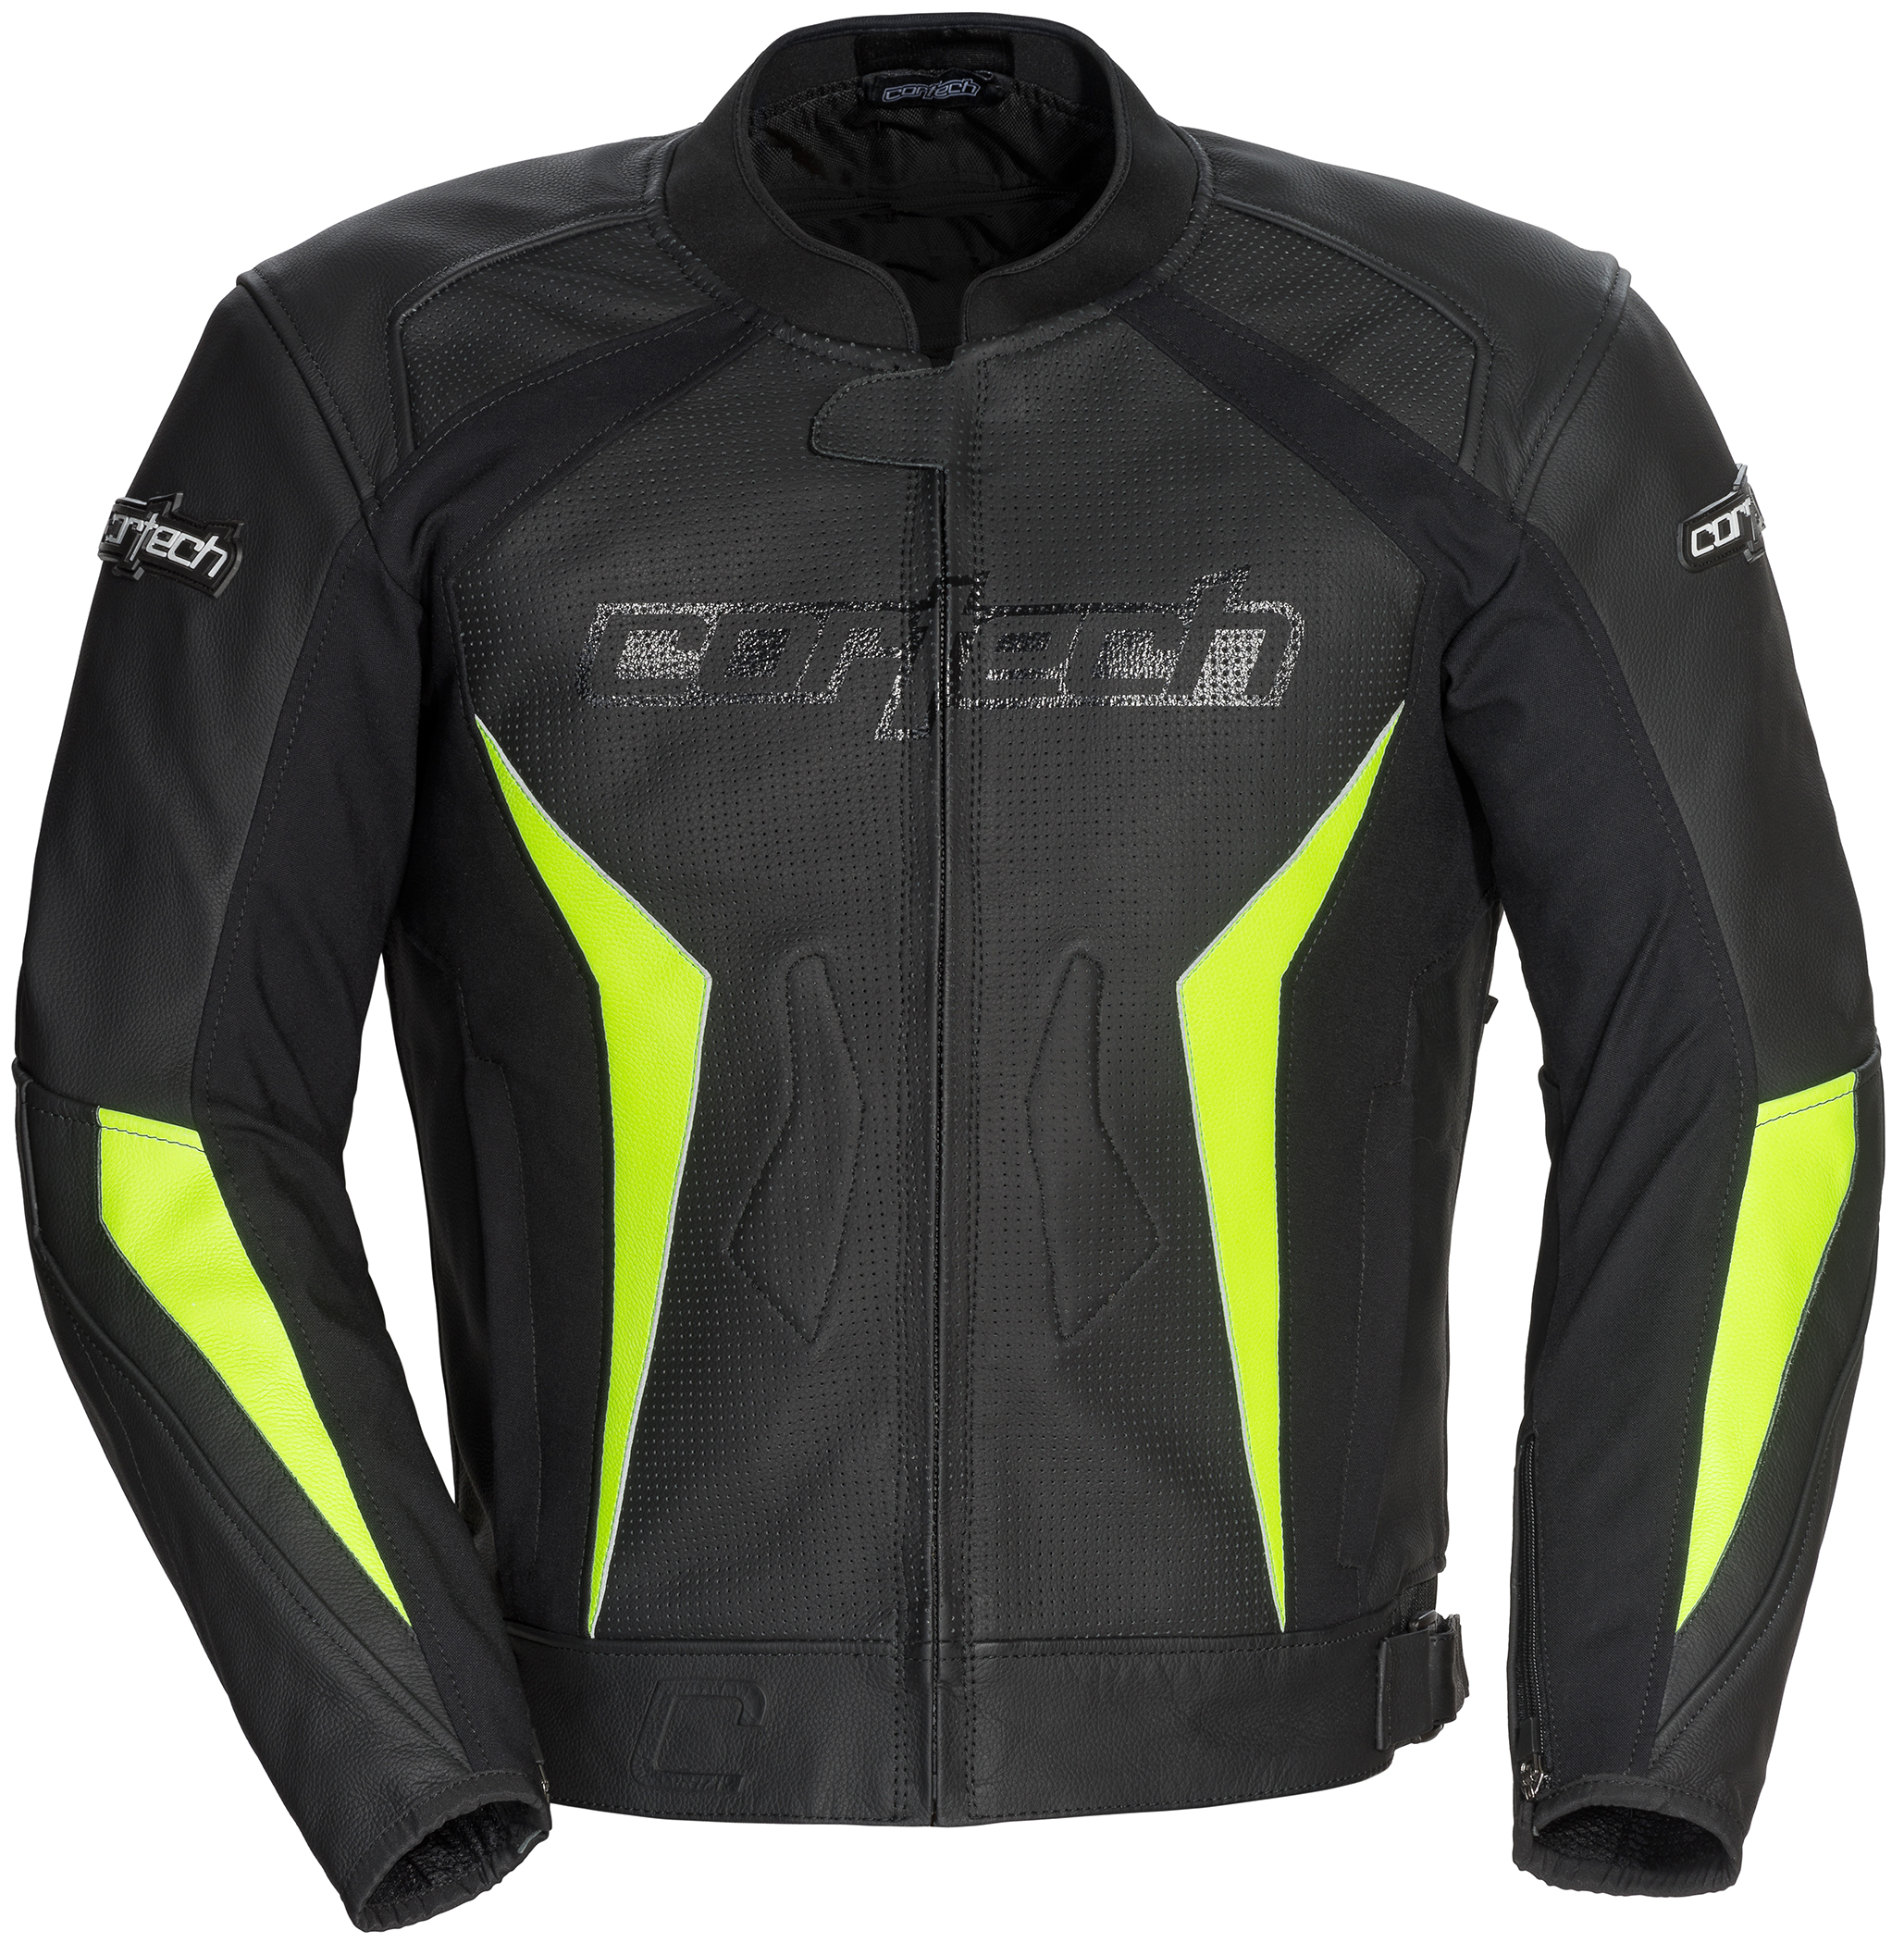 Cortech Latigo 2 Leather Jacket Black/Hi Viz SML  8992-0213-04